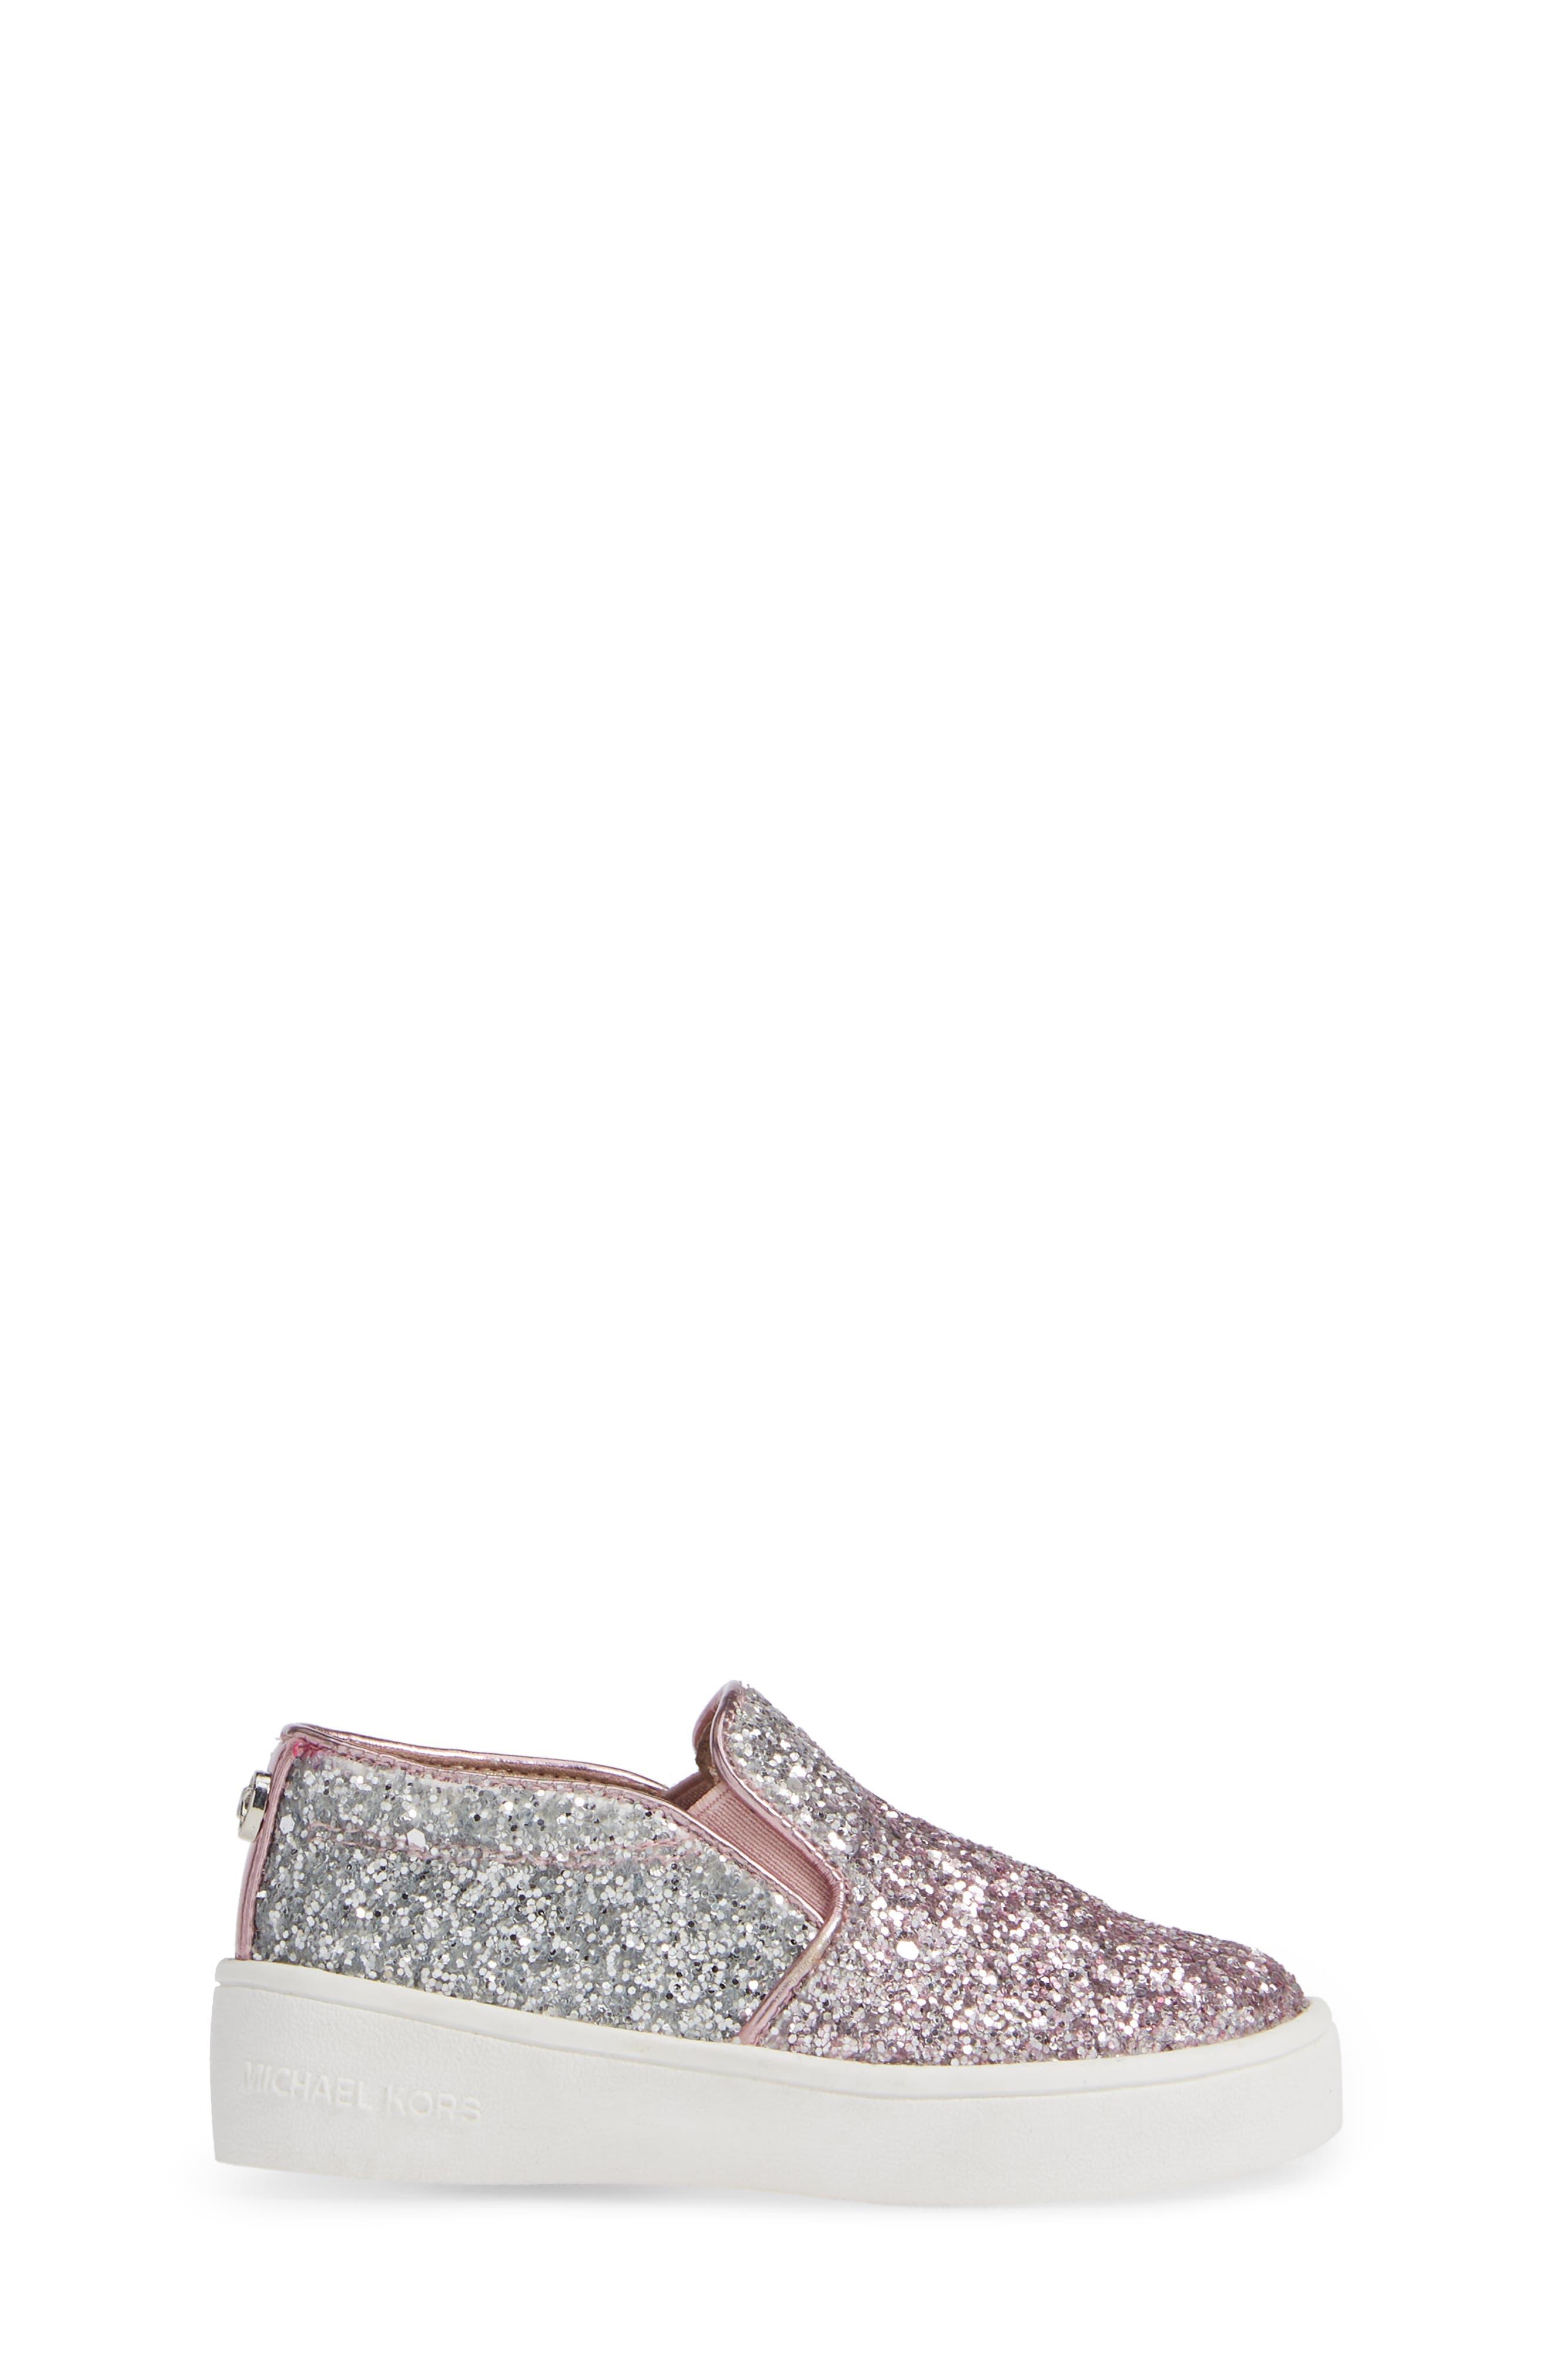 Ivy Ombré Glitter Slip-On Sneaker,                             Alternate thumbnail 5, color,                             Pink Silver